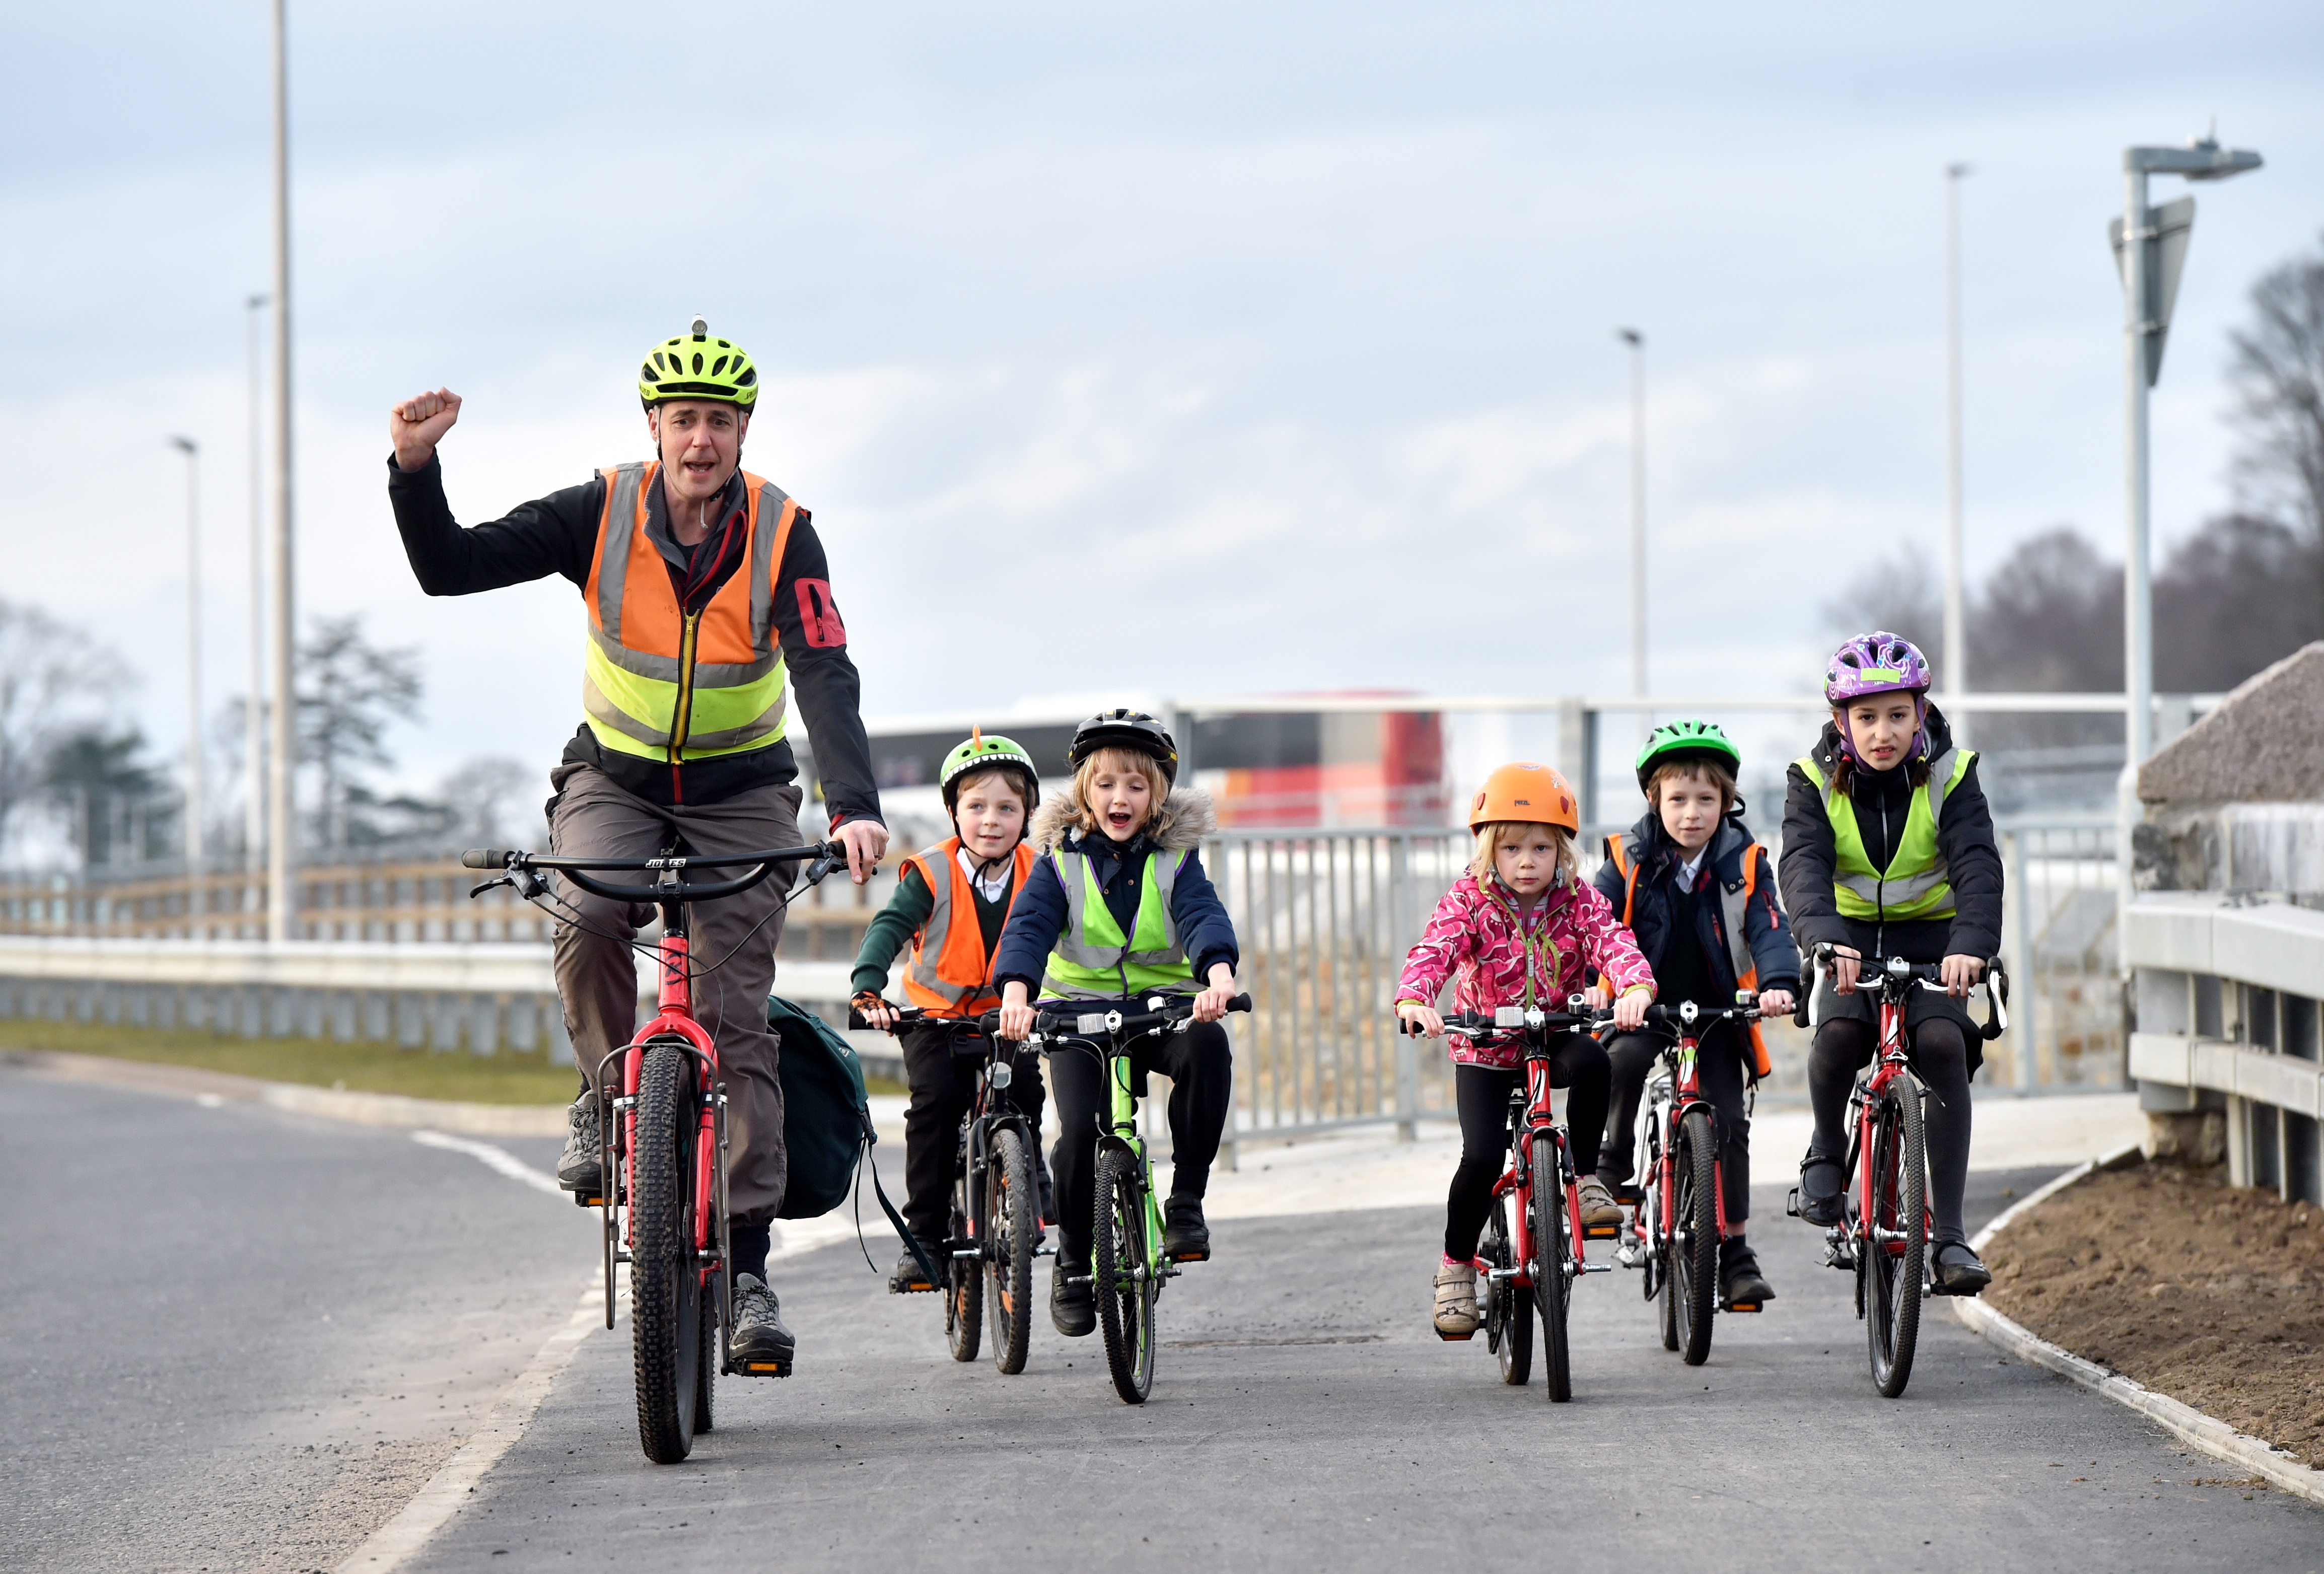 AWPR in Milltimber, Cyclists on the new bike path.   Pictured are Carl Gerrard, Arran Williams, Isla Gerrard, Katy Hay, Rowan and Leya Oren-Woods.